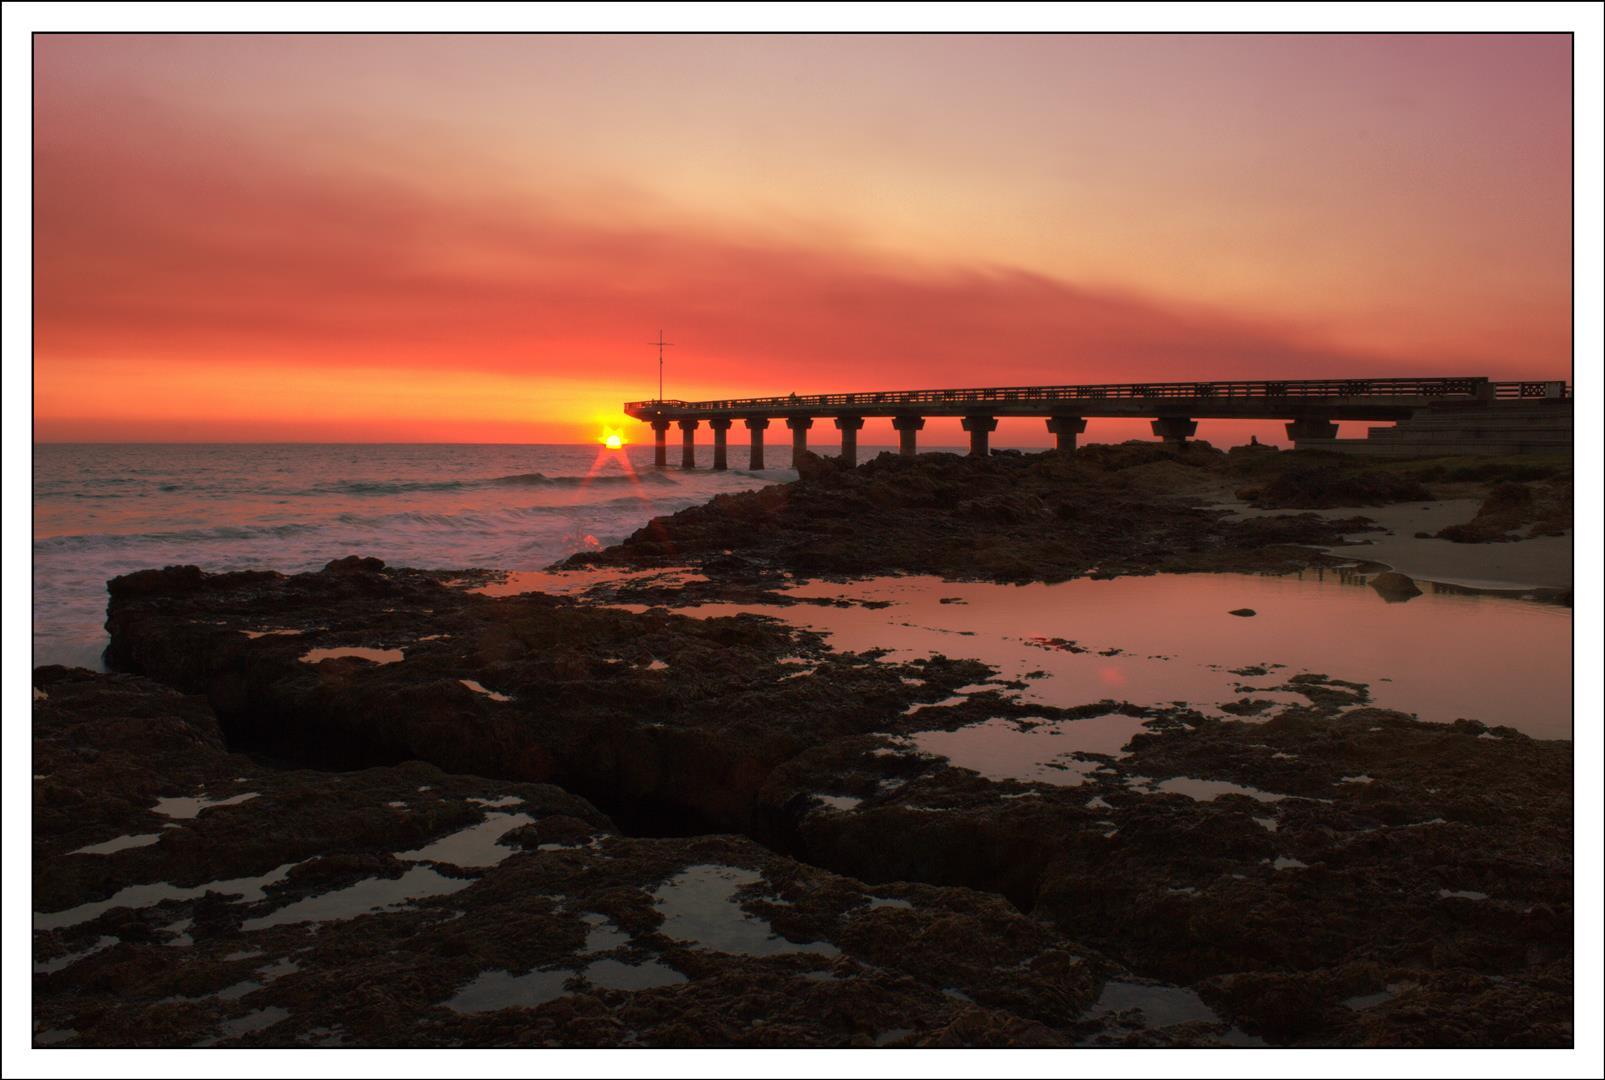 Port elizabeth south africa andrew harvard photography - What to do in port elizabeth south africa ...